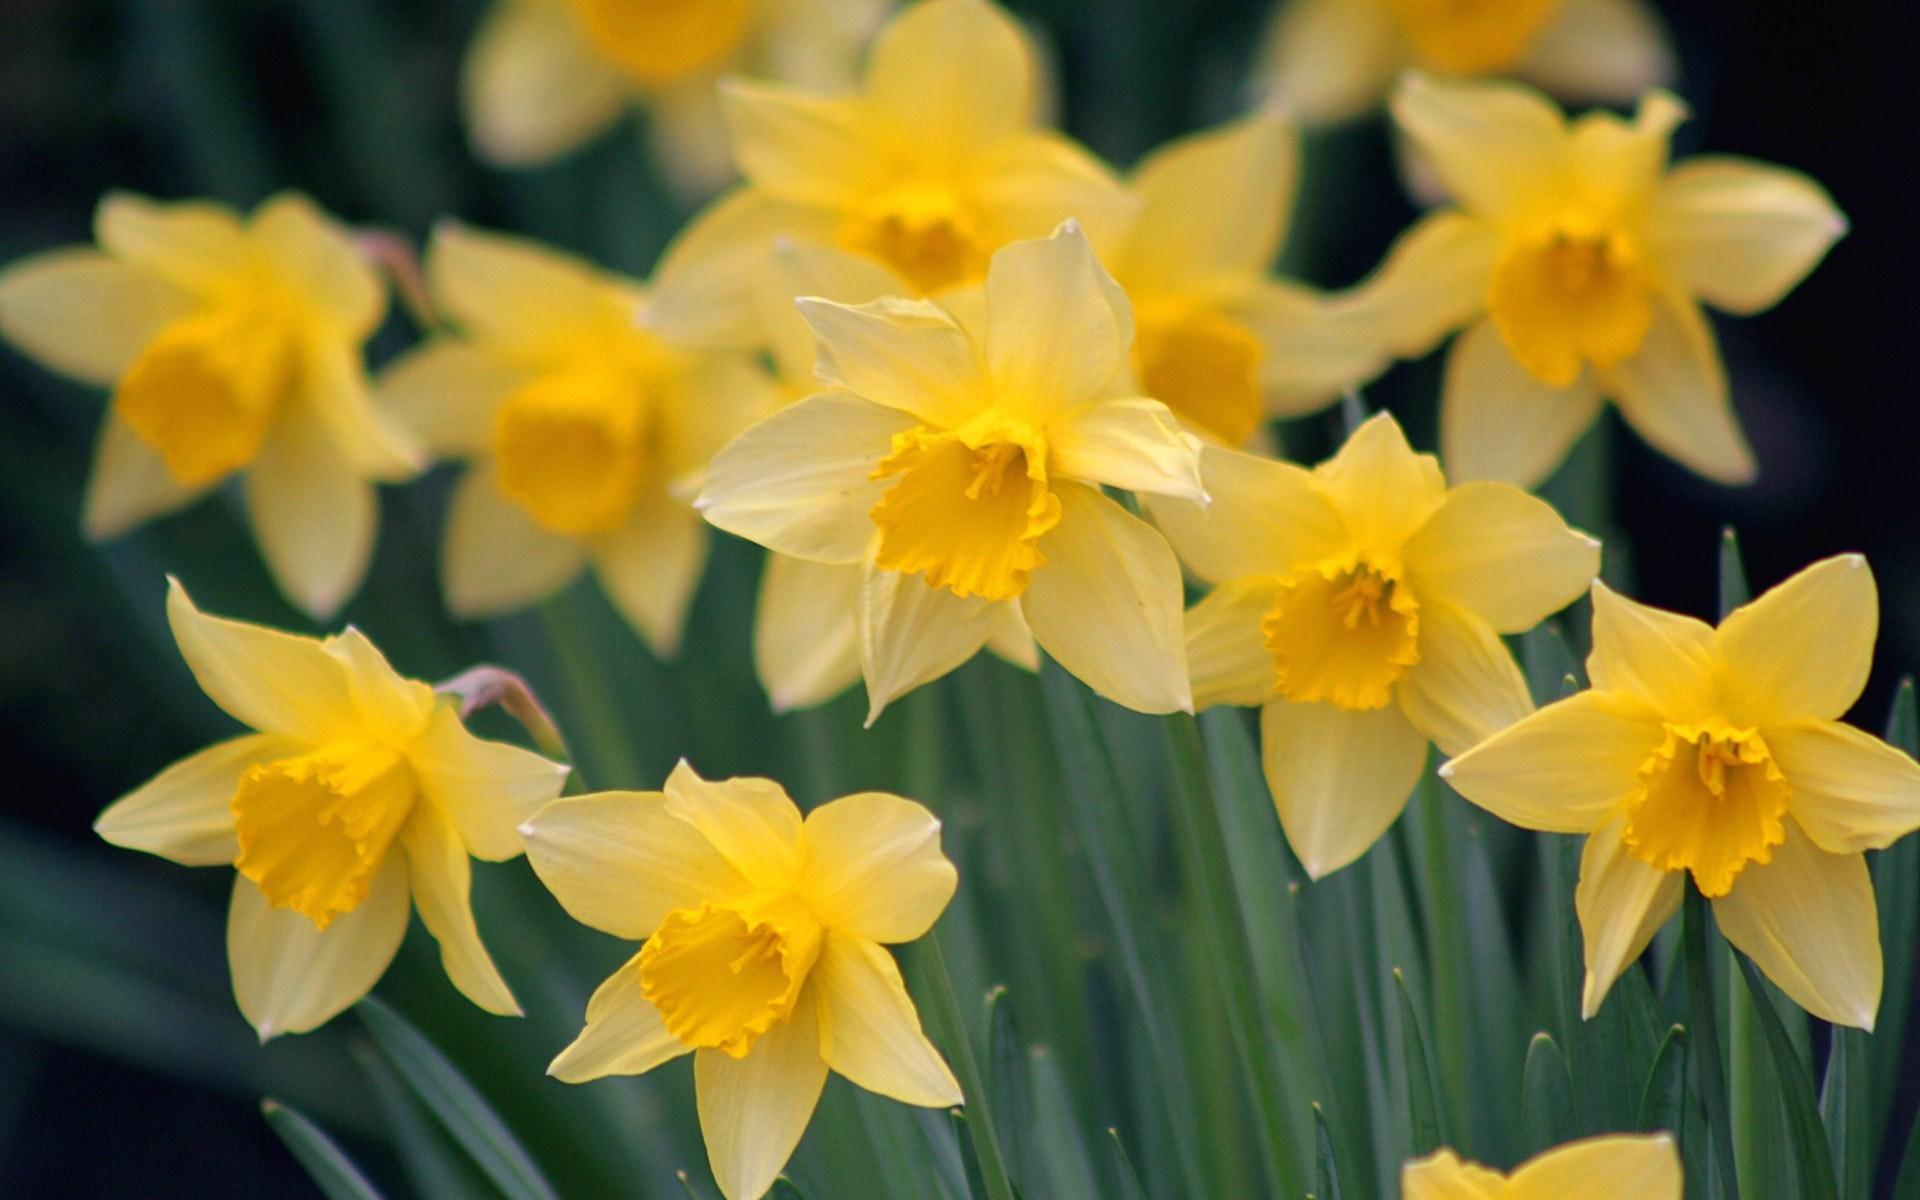 daffodils flower beautiful